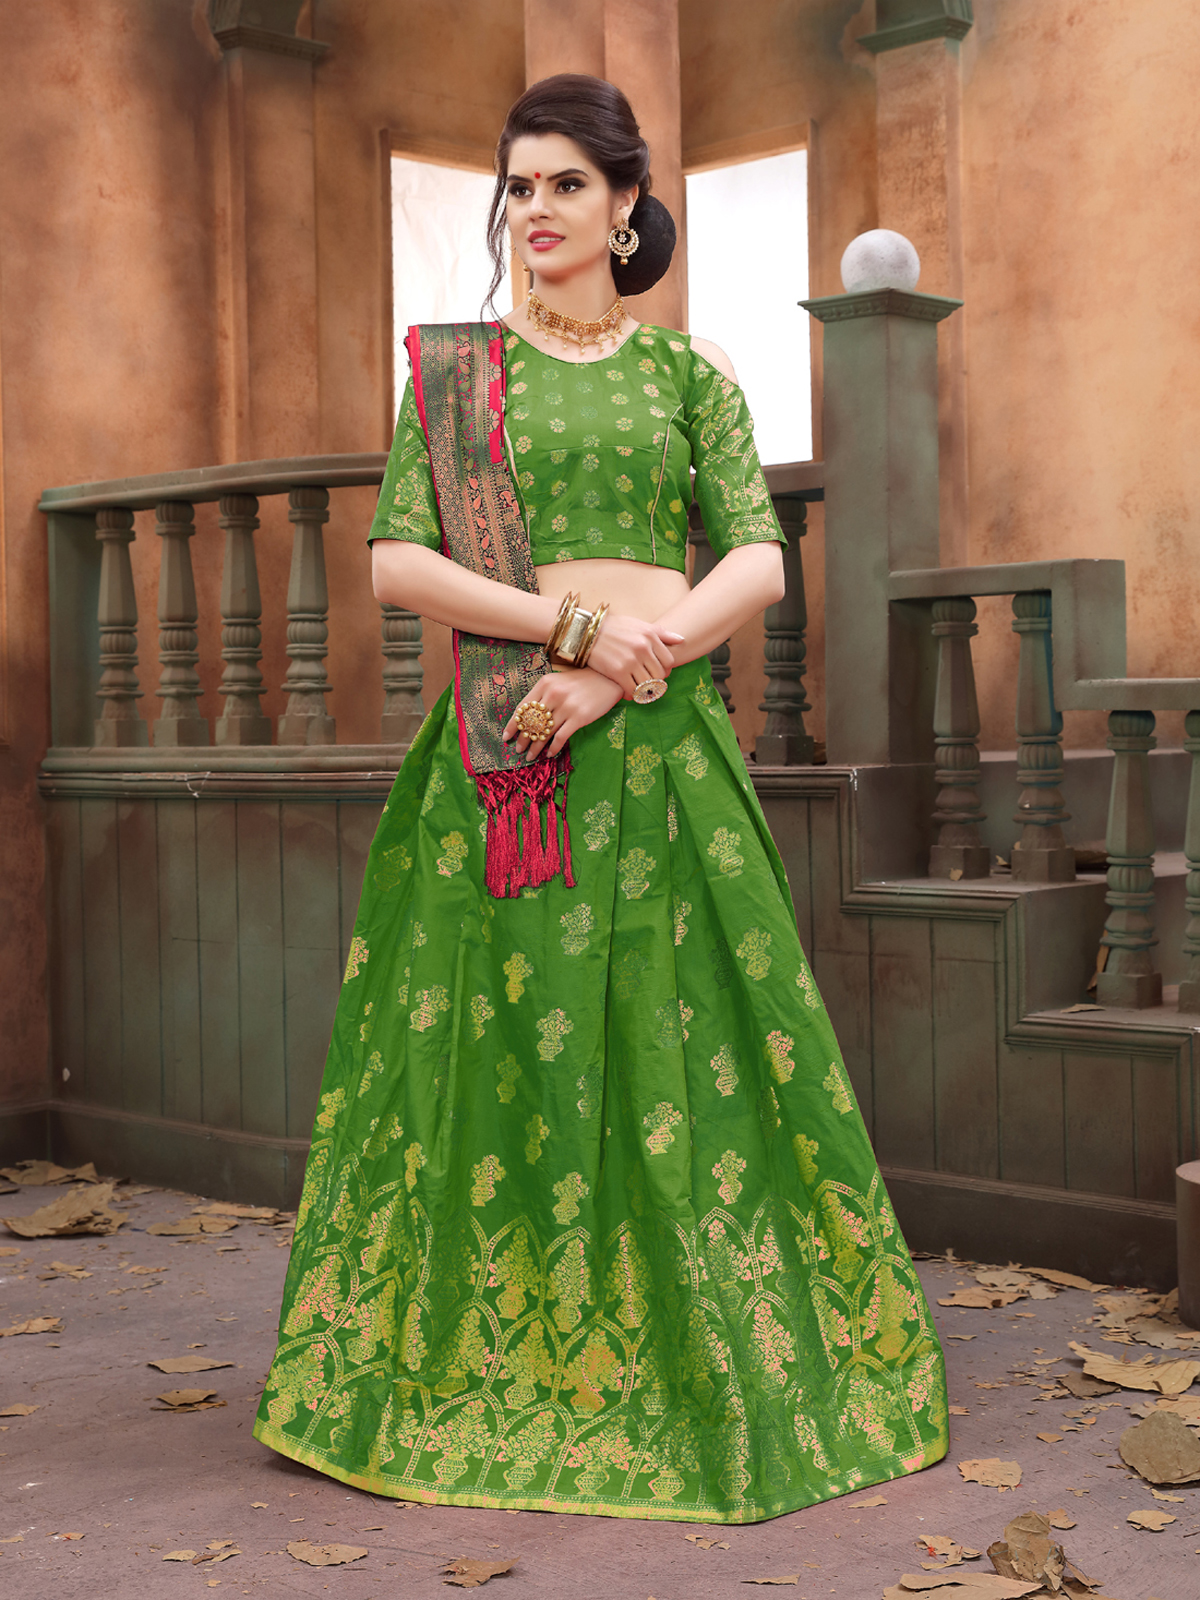 676a69bca07b8 Light-parrot-green woven art silk semi stitched lehenga with dupatta -  KMOZI - 2713803